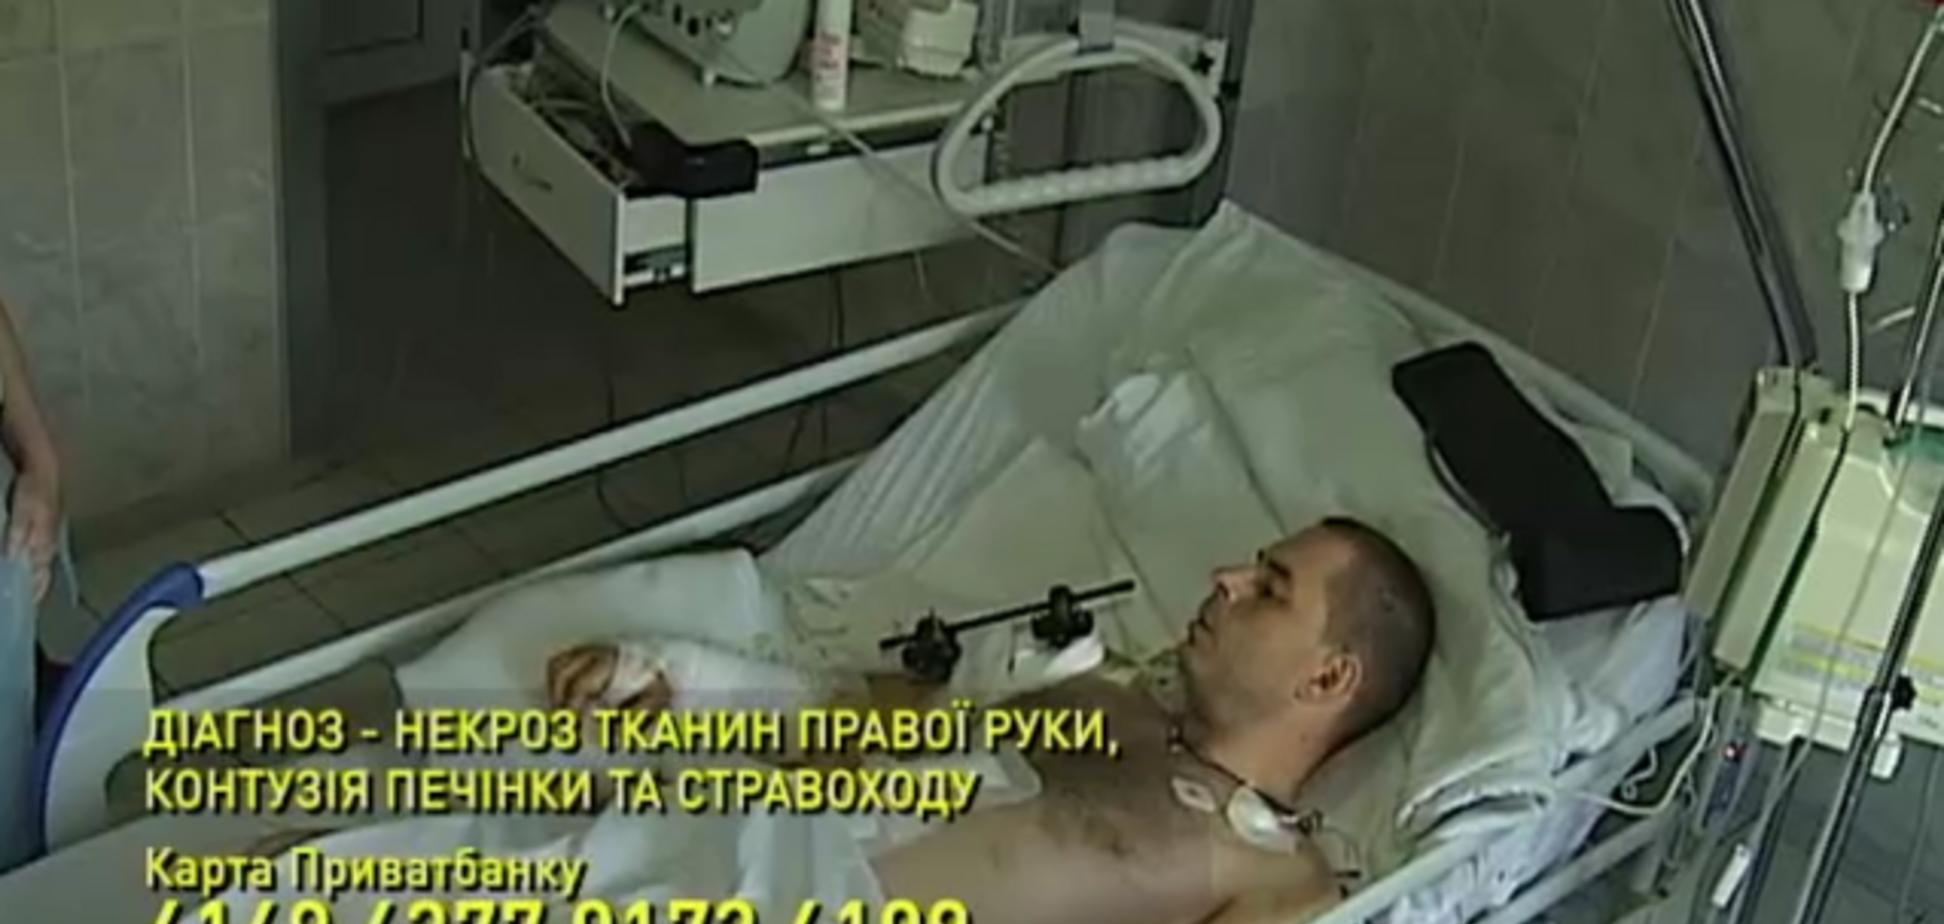 Тяжело раненому бойцу батальона 'Азов' нужно 200 тысяч гривен